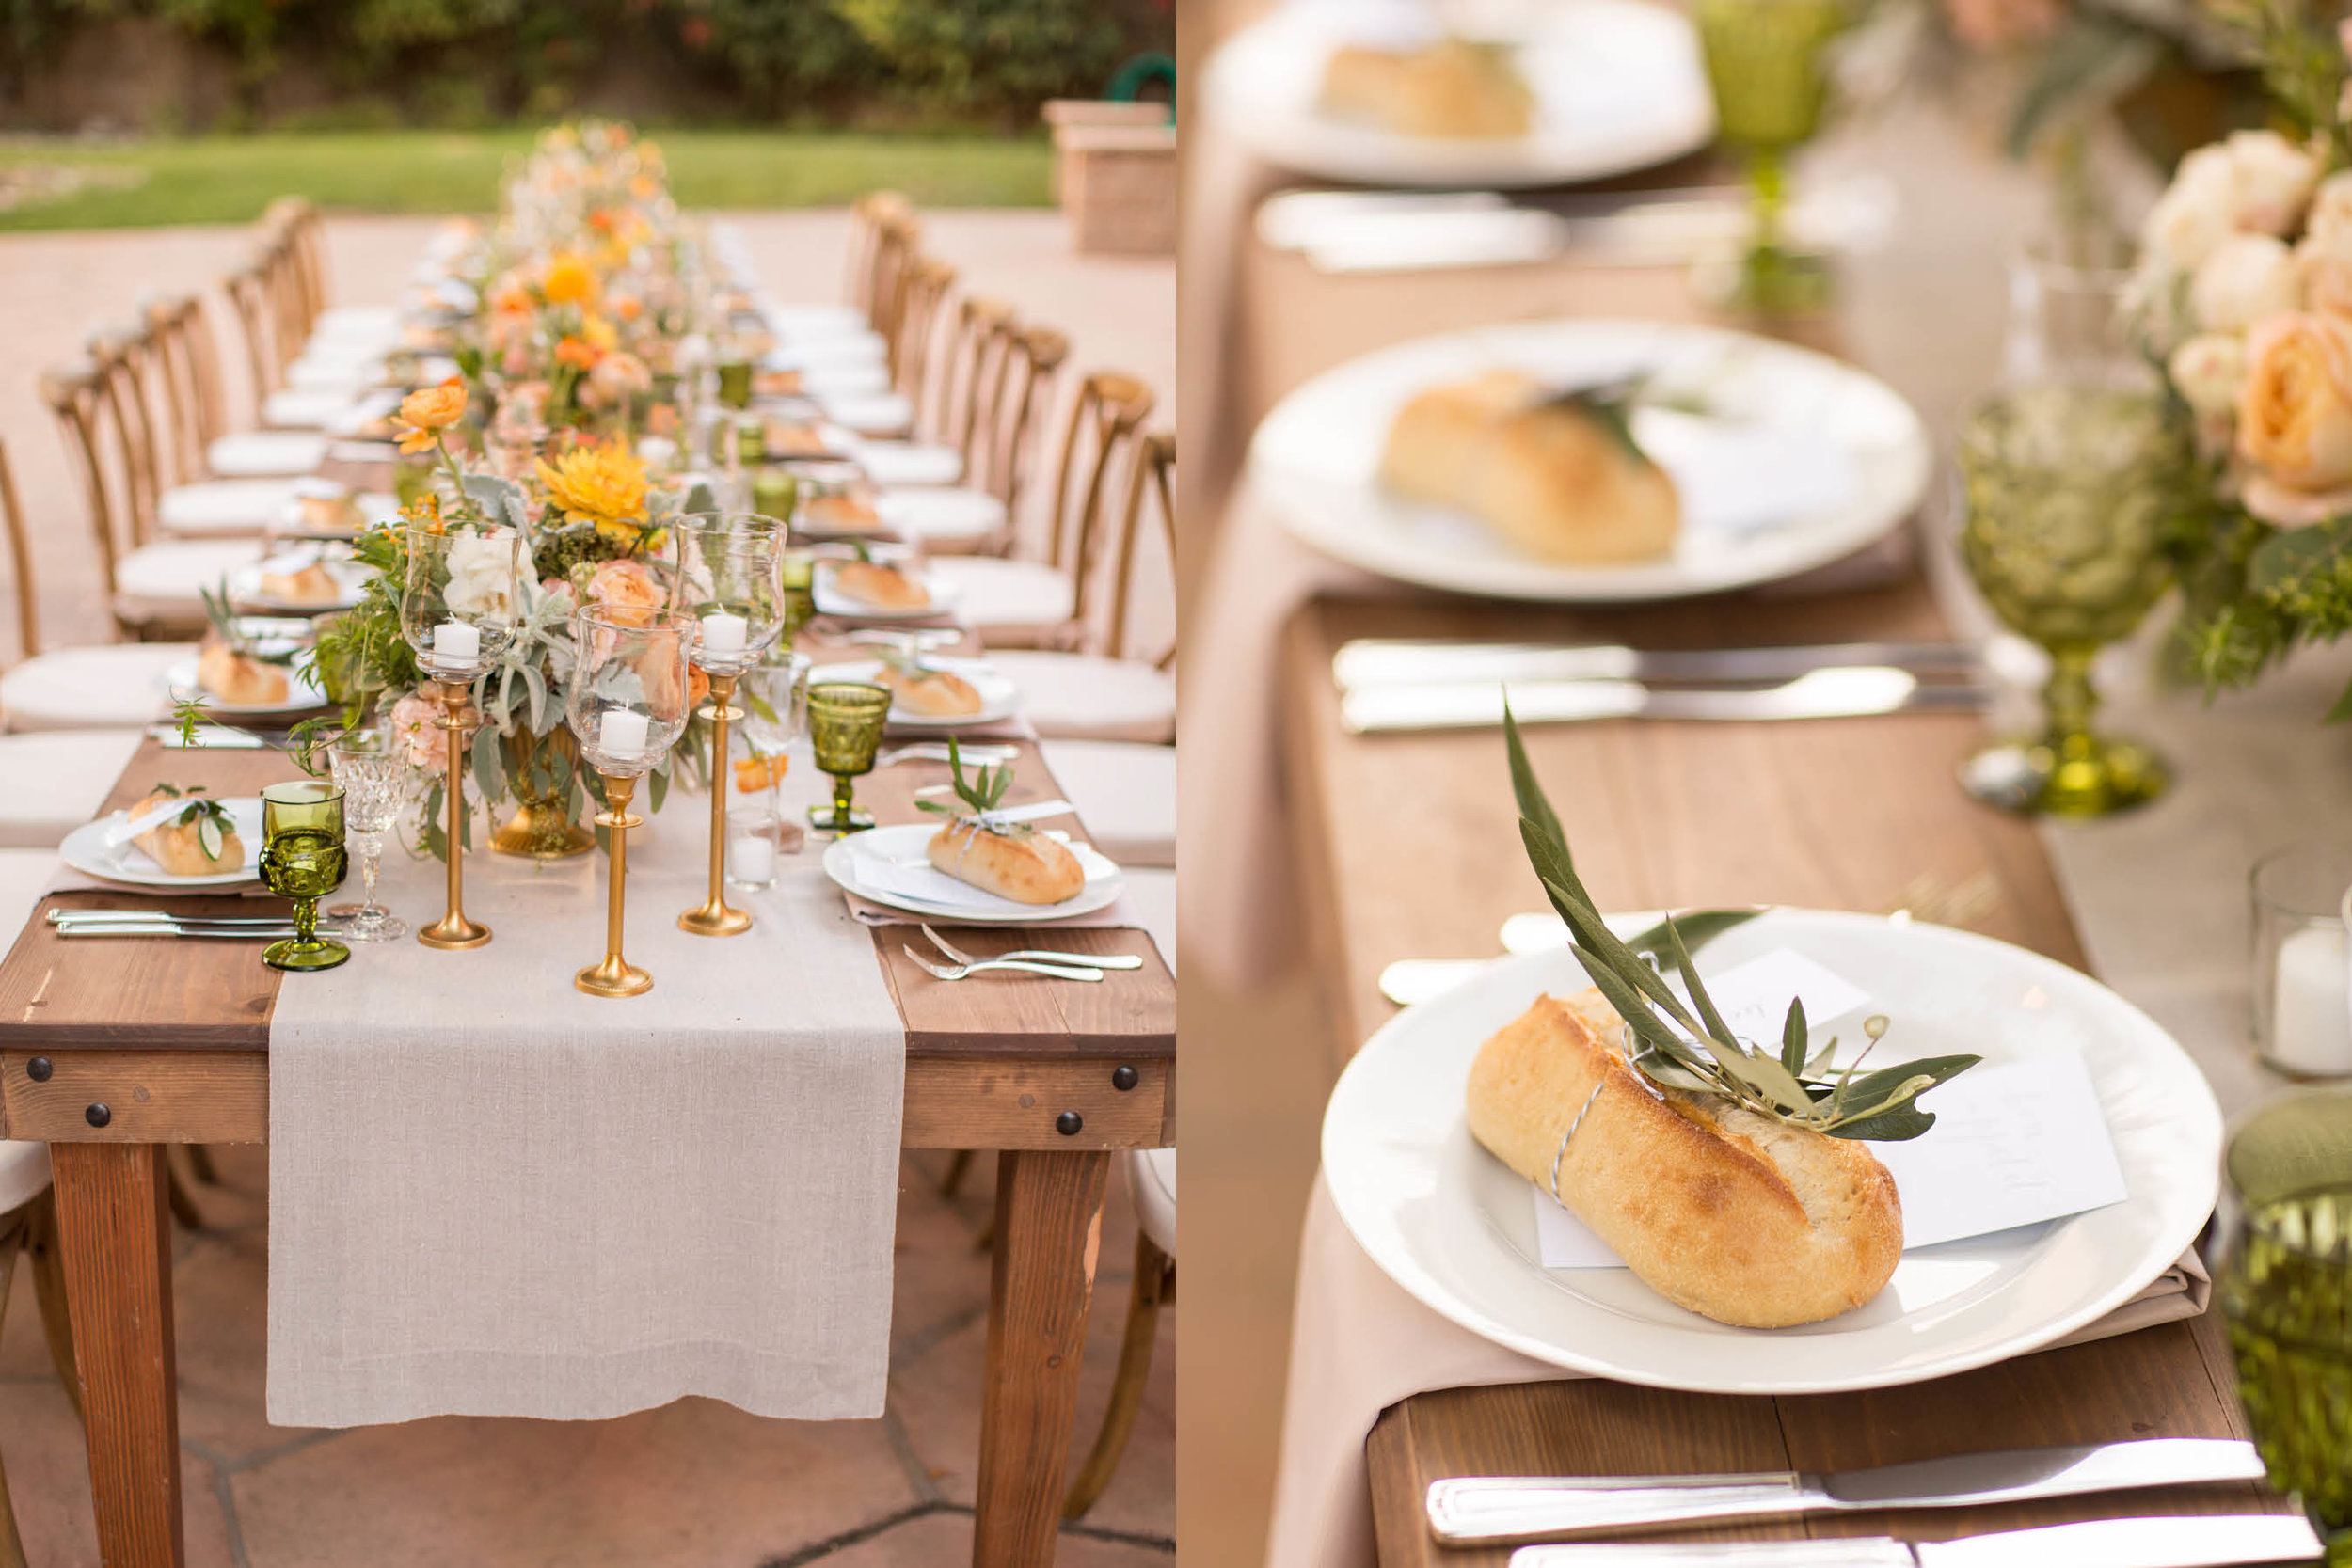 santa-barbara-elopement-wedding-intimate-vineyard-firestone-wine-country-planner-coordinator-day-of-santa-ynez-vintage-glassware (19).jpg